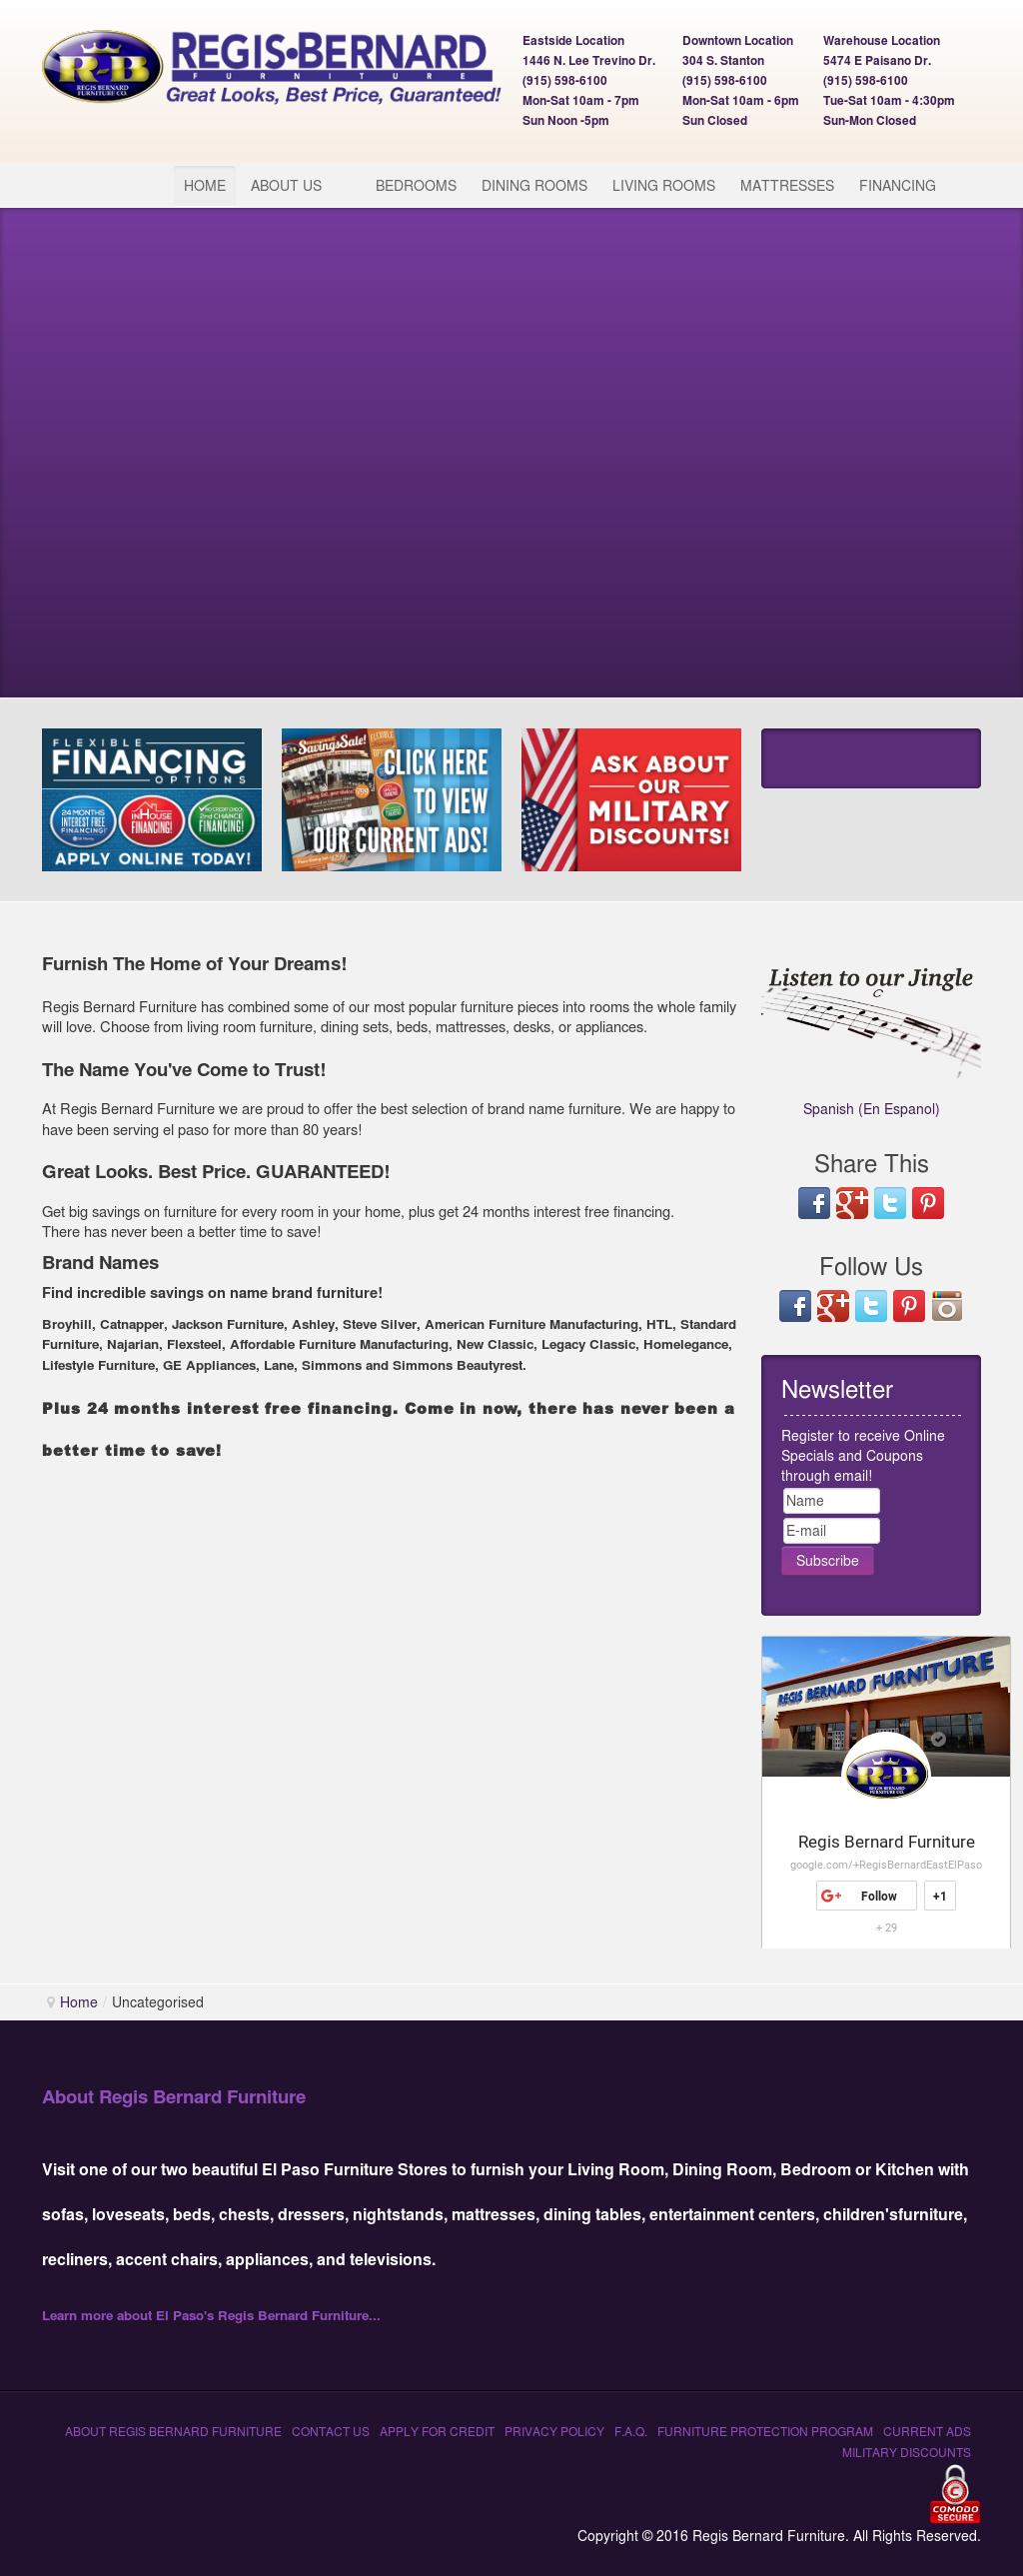 Beau Regis Bernard Furniture Competitors, Revenue And Employees   Owler Company  Profile